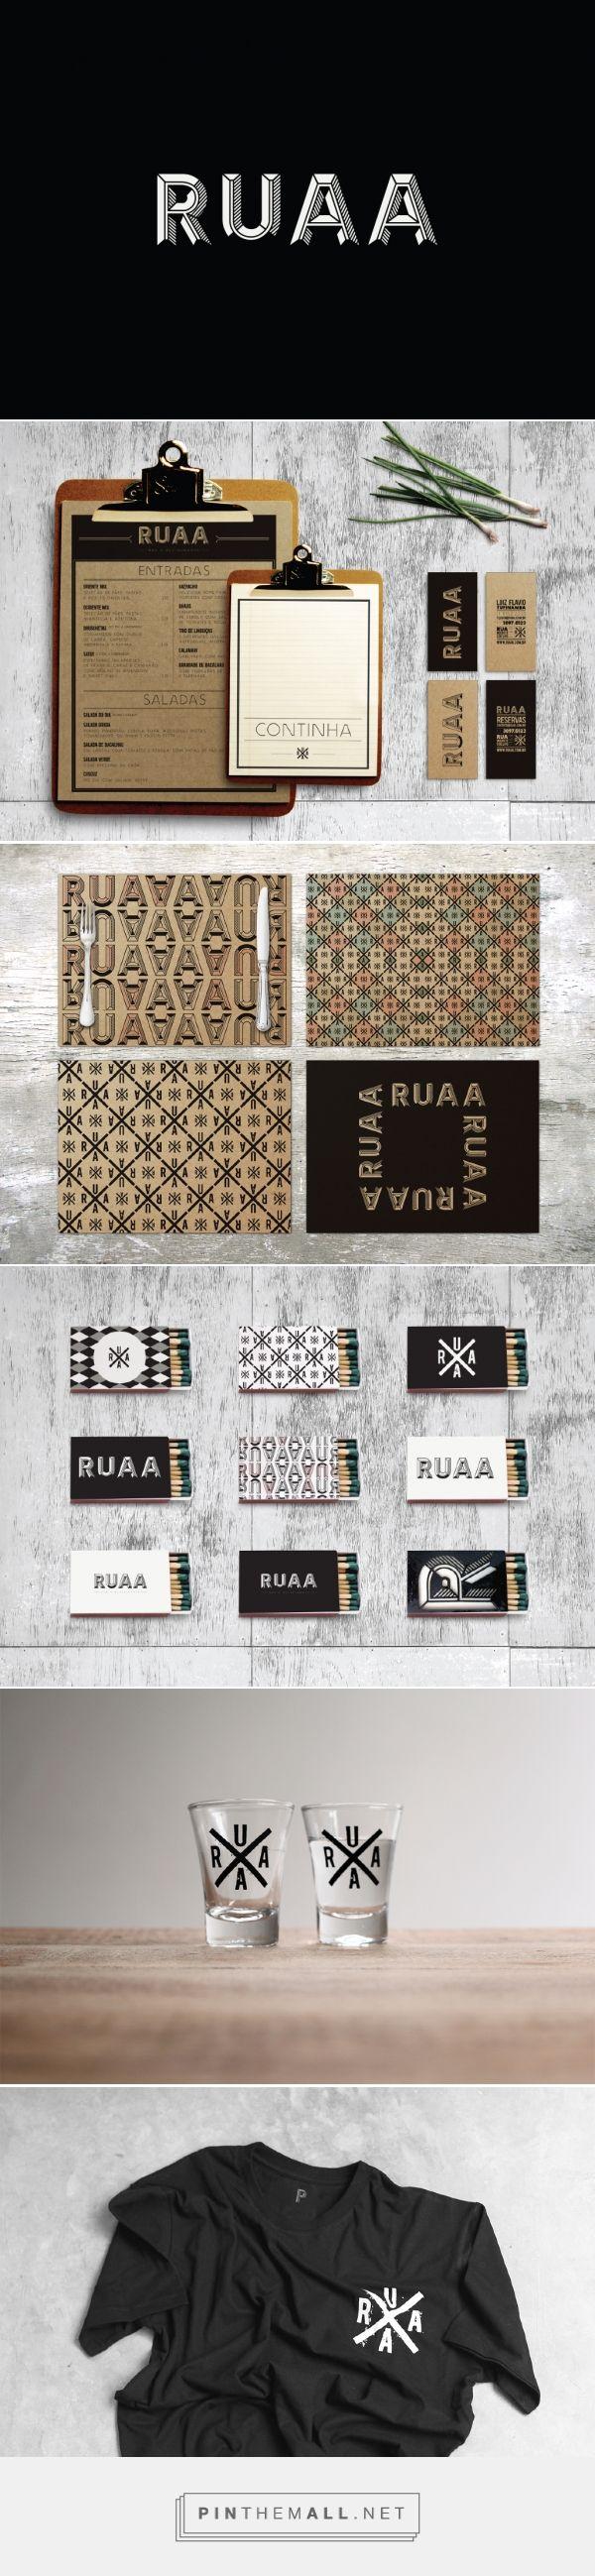 White apron menu warrington - Ruaa Restaurant Branding And Menu Design By Pedro Paulino